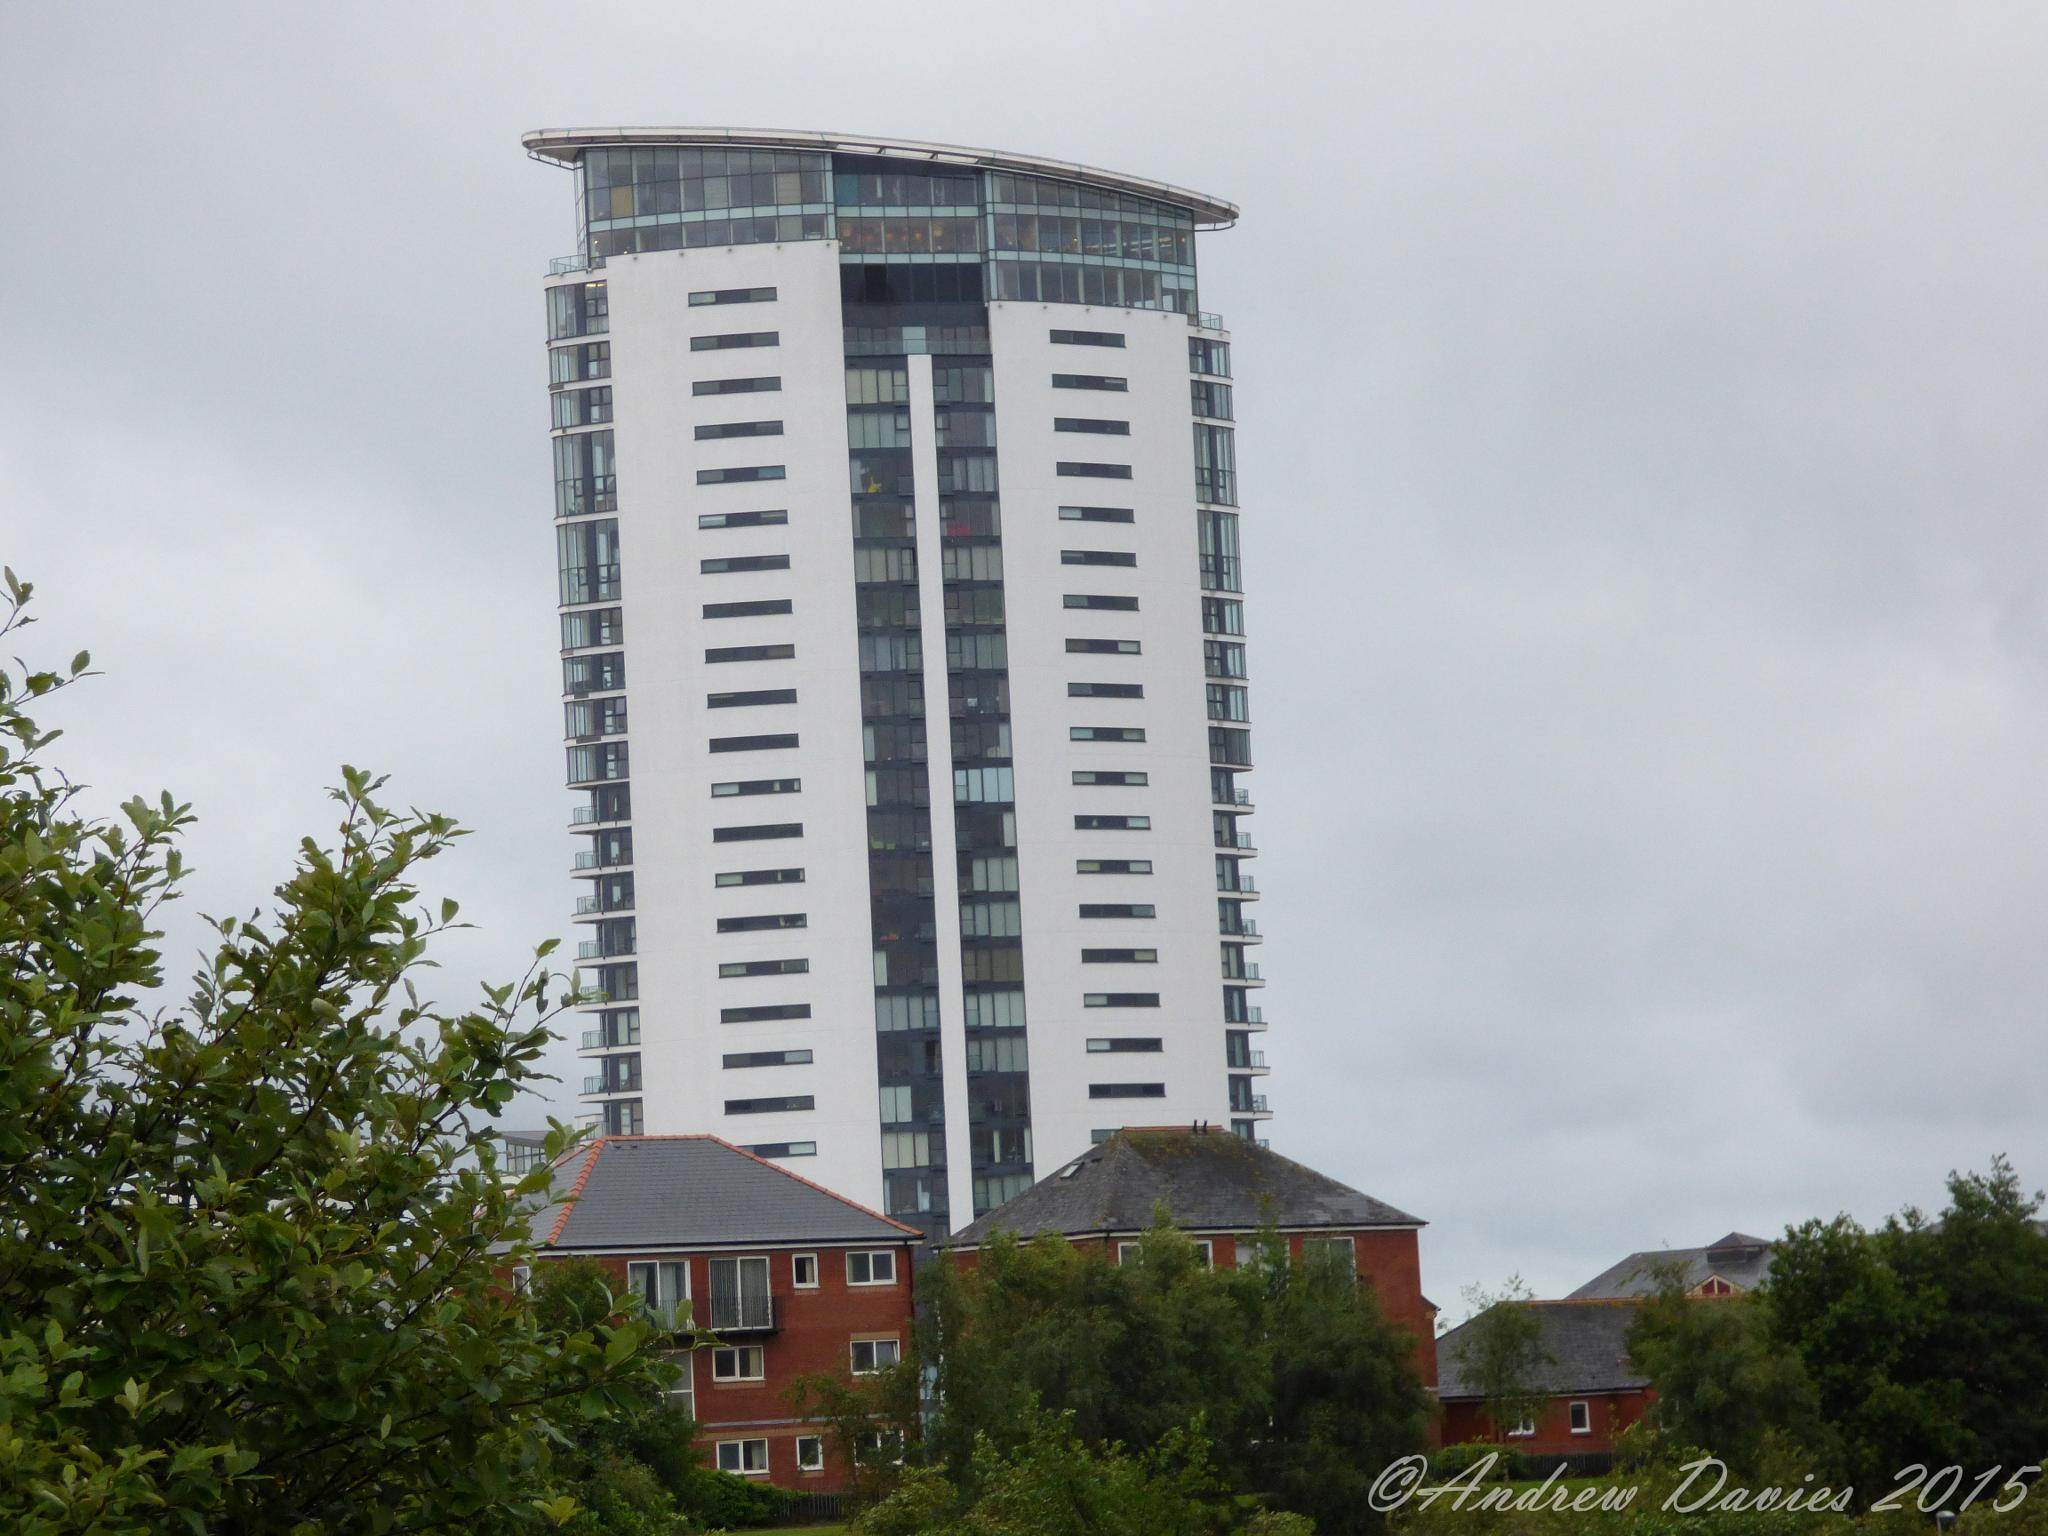 Swanseas Tallest Building by Andrew Davies